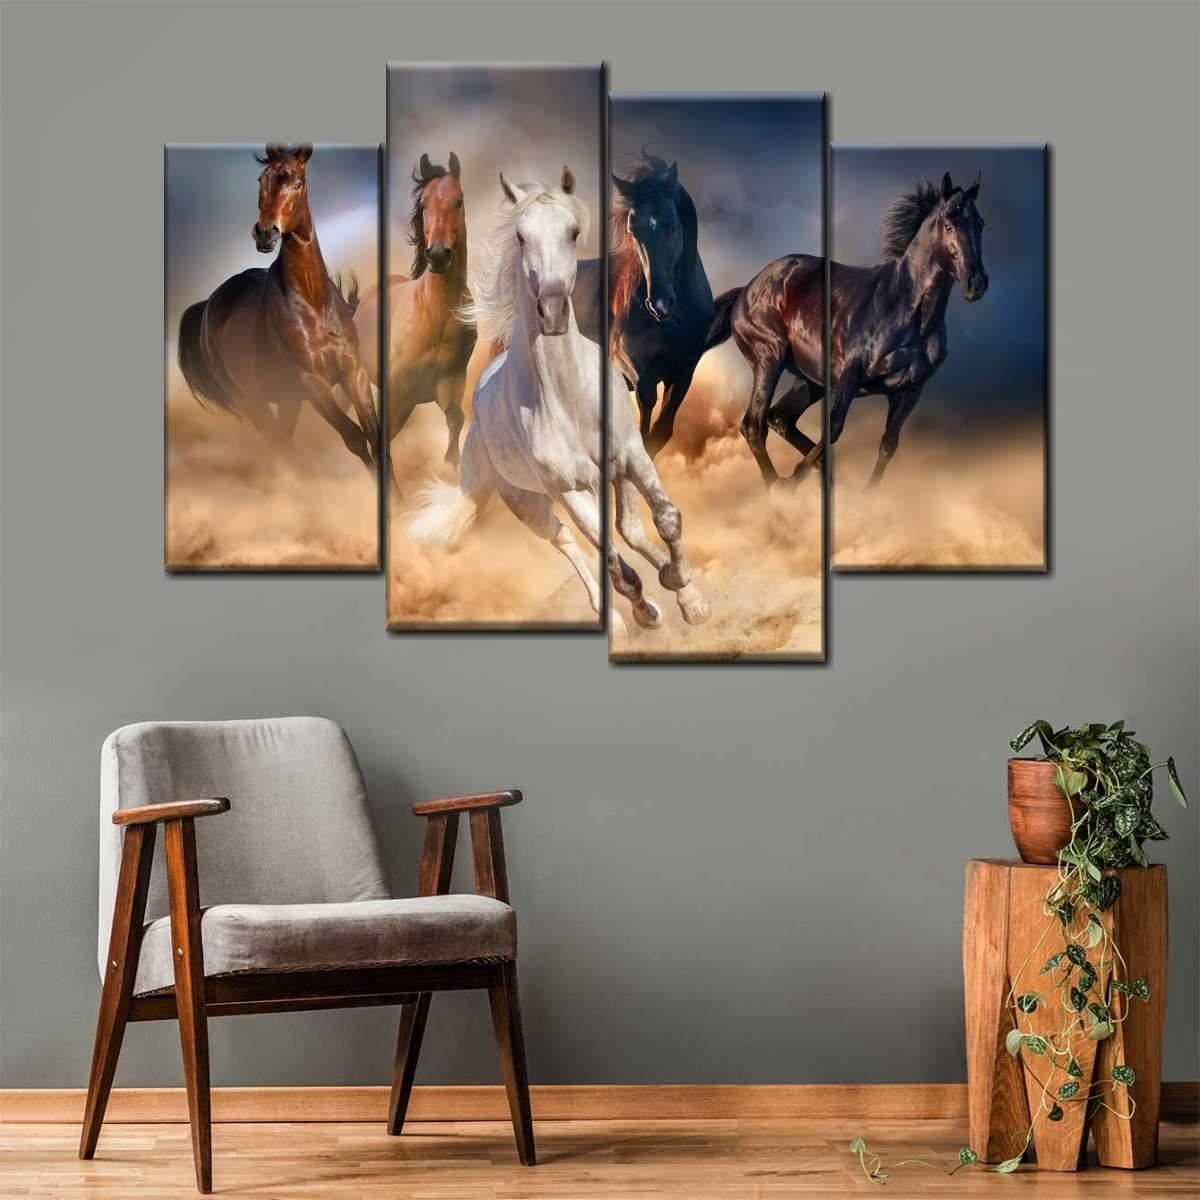 Running in the Wild Multi Panel Canvas Wall Art